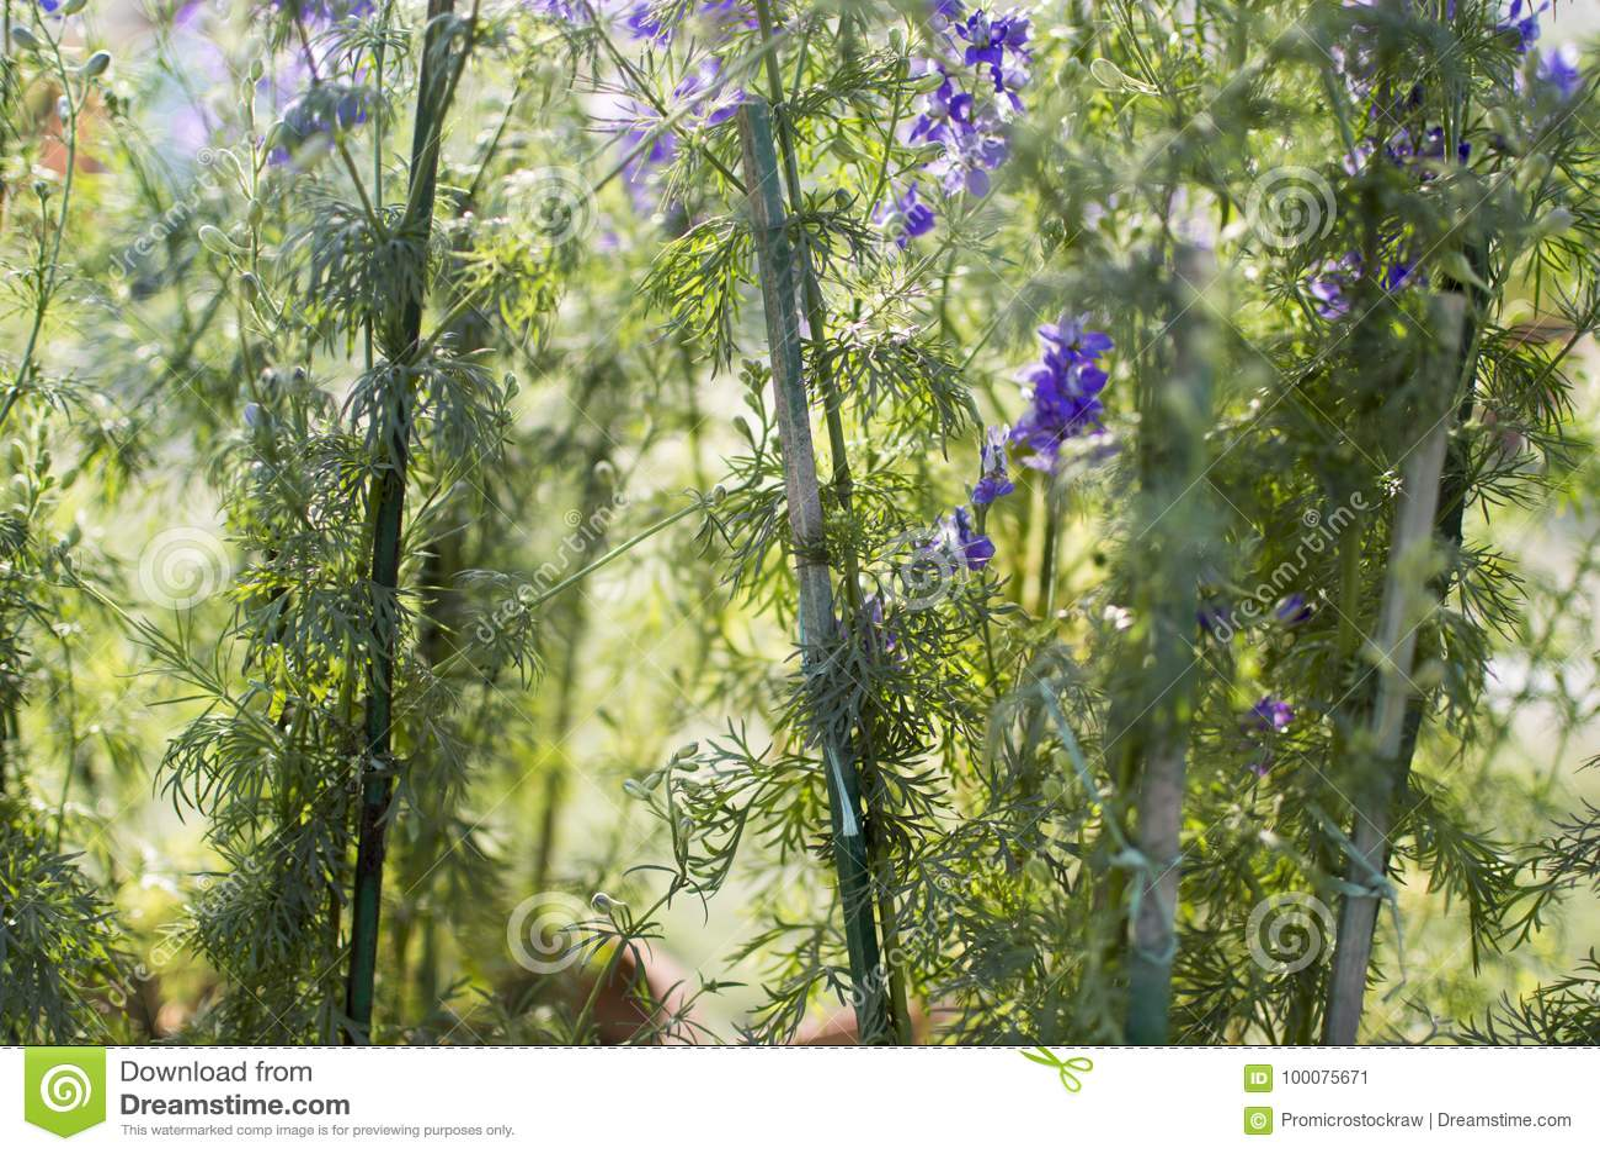 Jungle Of Blue Flowers And Plants Stock Image Image Of Botanical